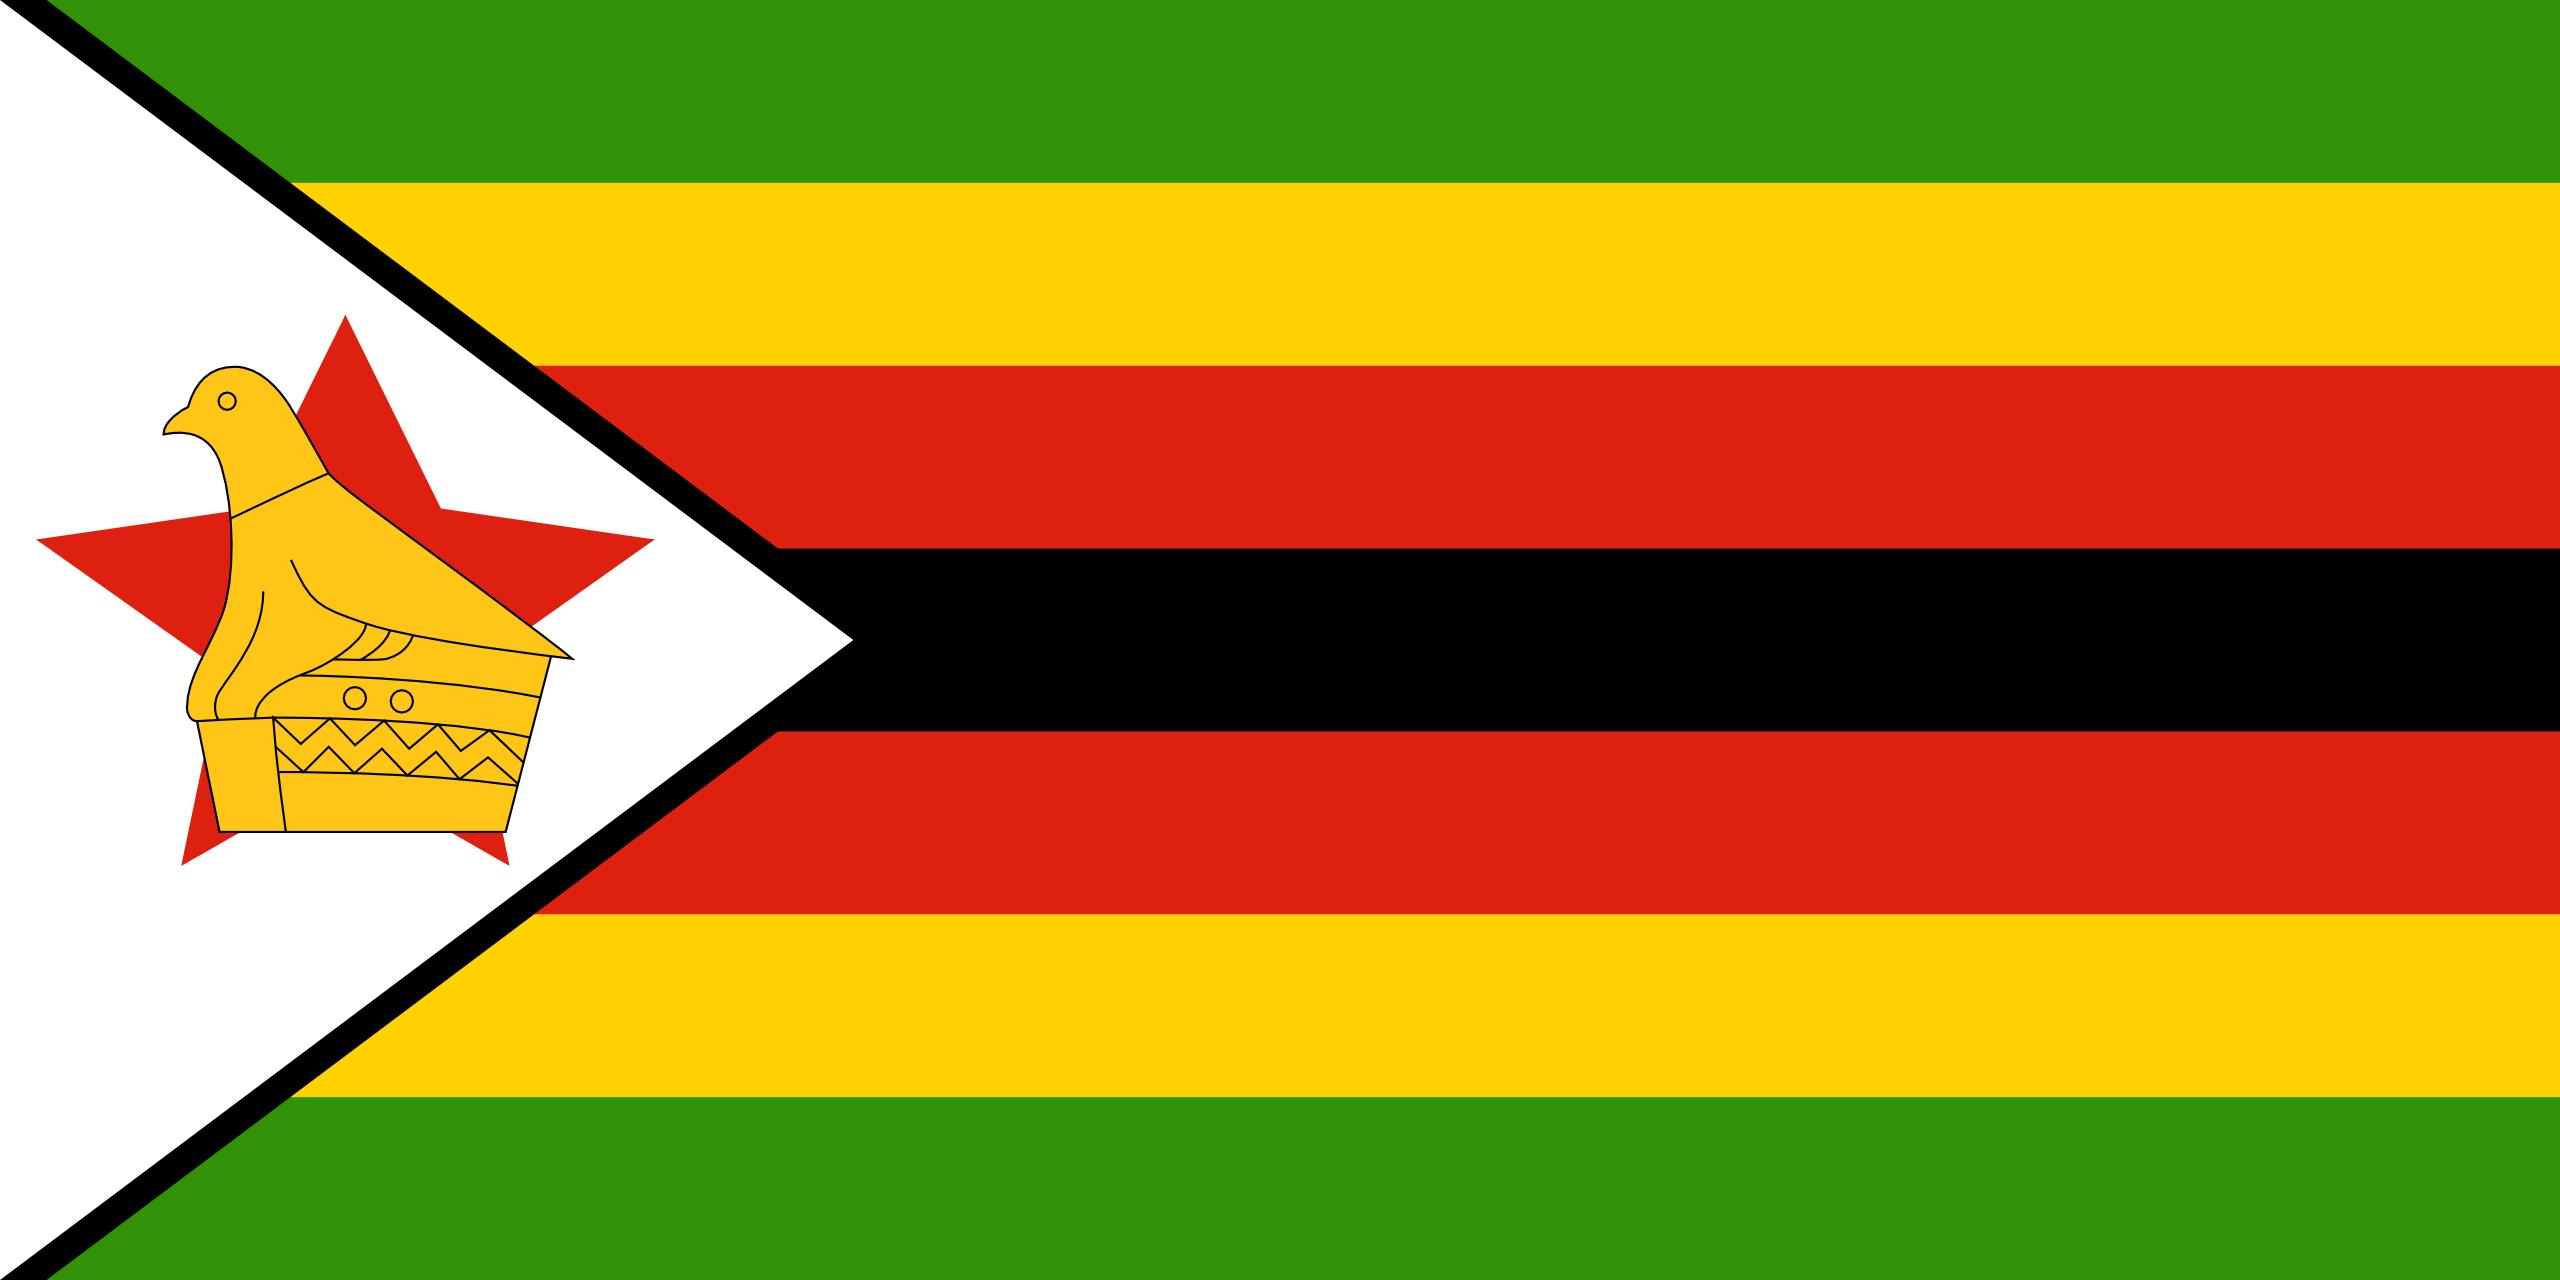 Зимбабве, страна, Эмблема, логотип, символ - Обои HD - Профессор falken.com